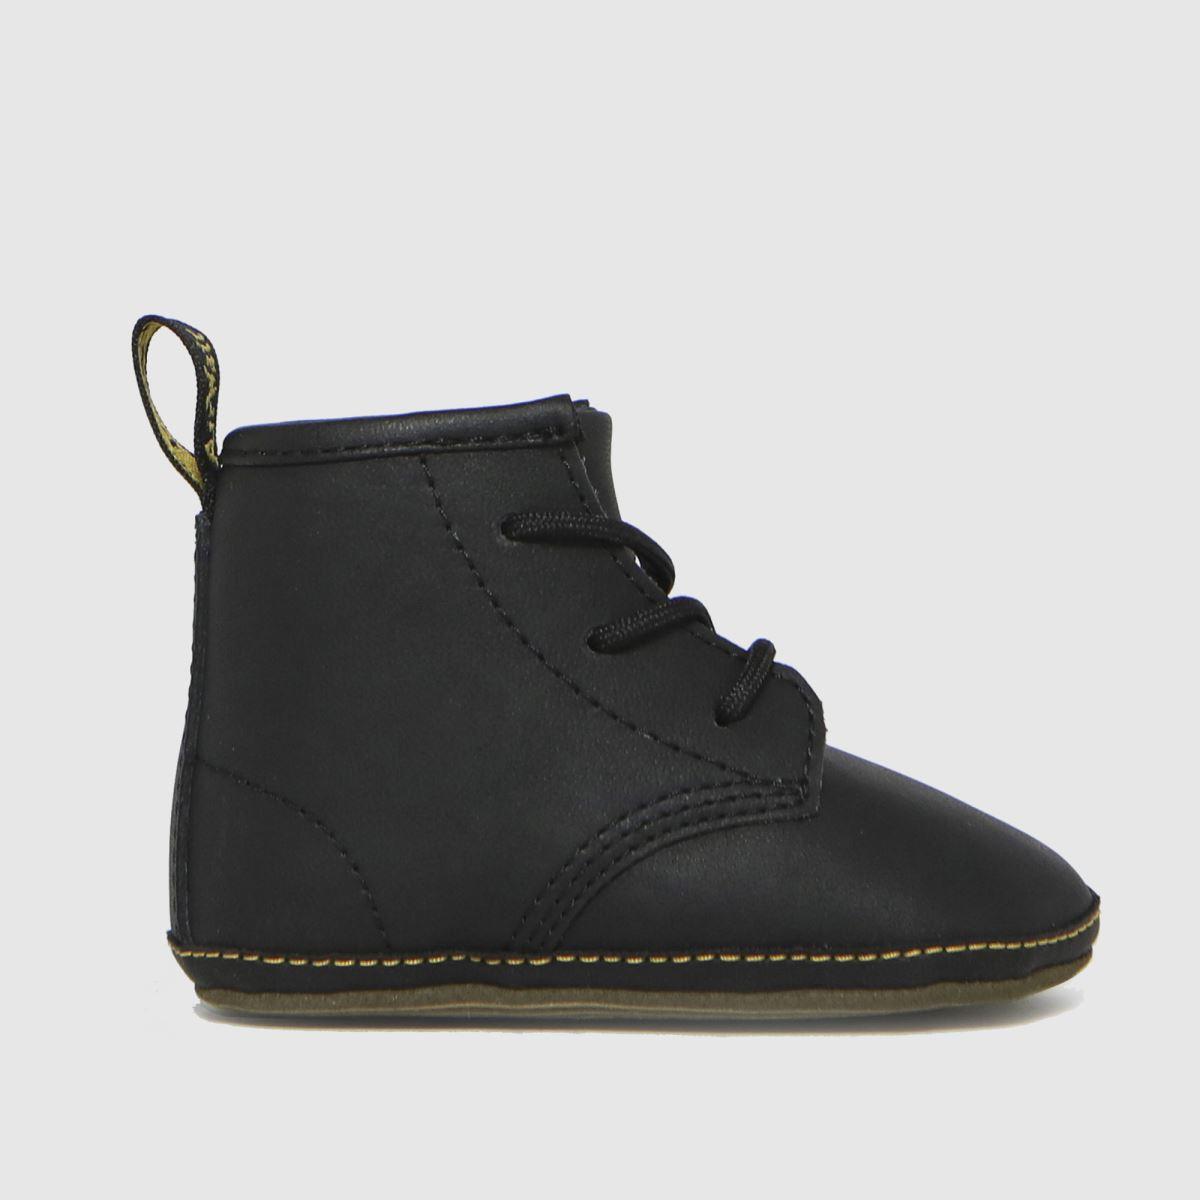 Dr Martens Black 1460 Crib Shoes Baby